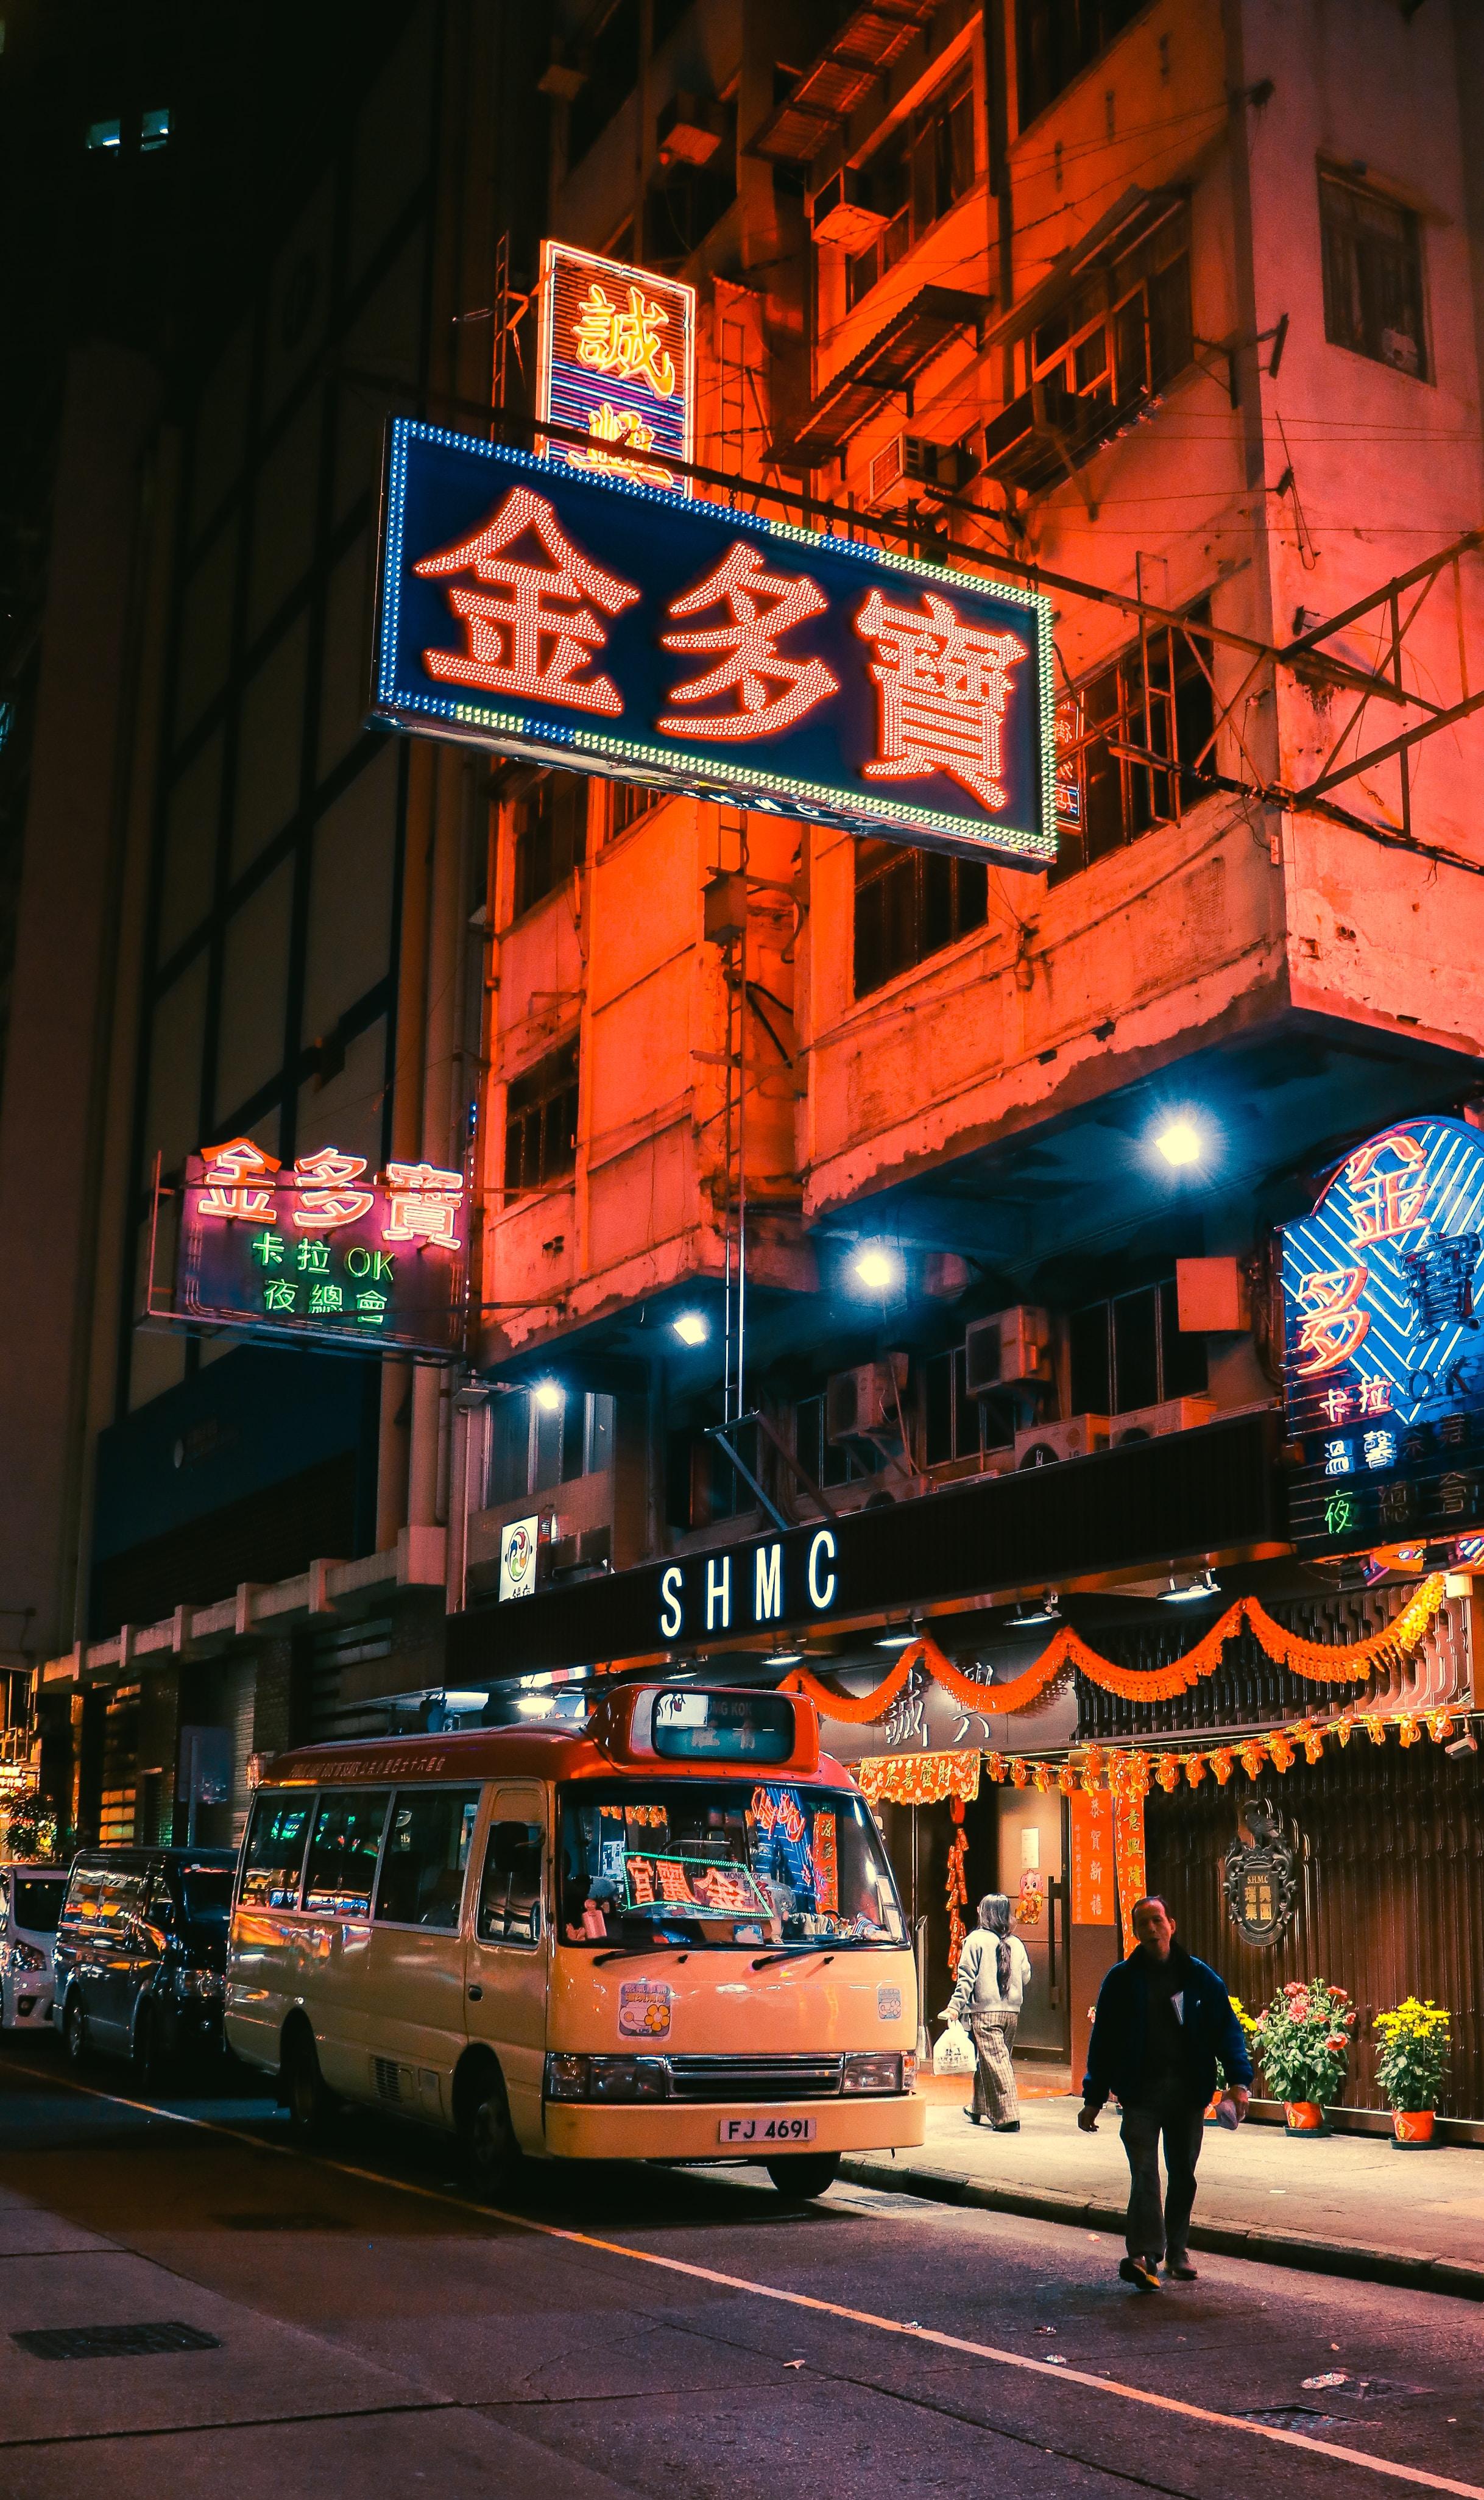 people walking on street near building during nighttime